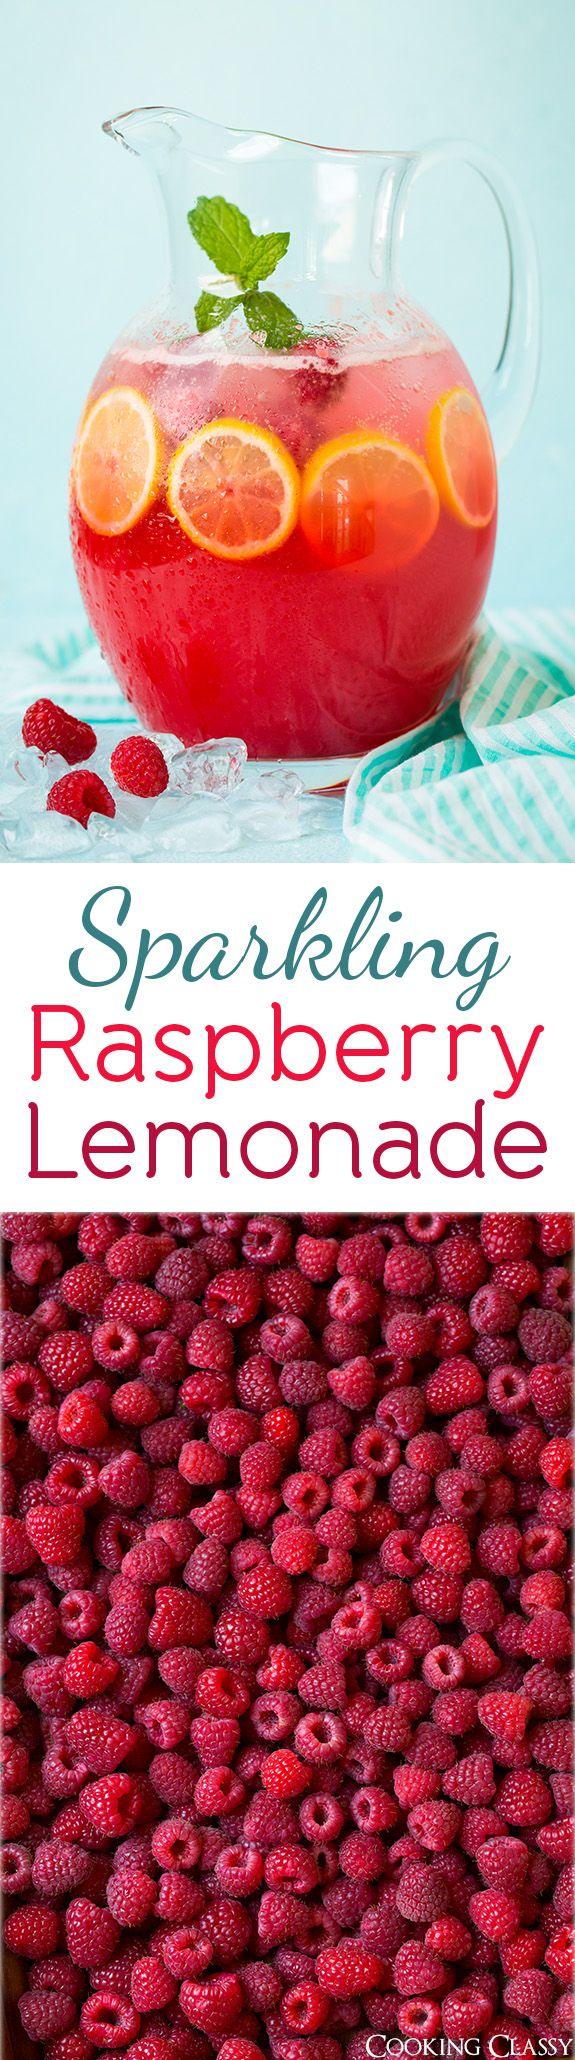 Sparkling Raspberry Lemonade - Cooking Classy